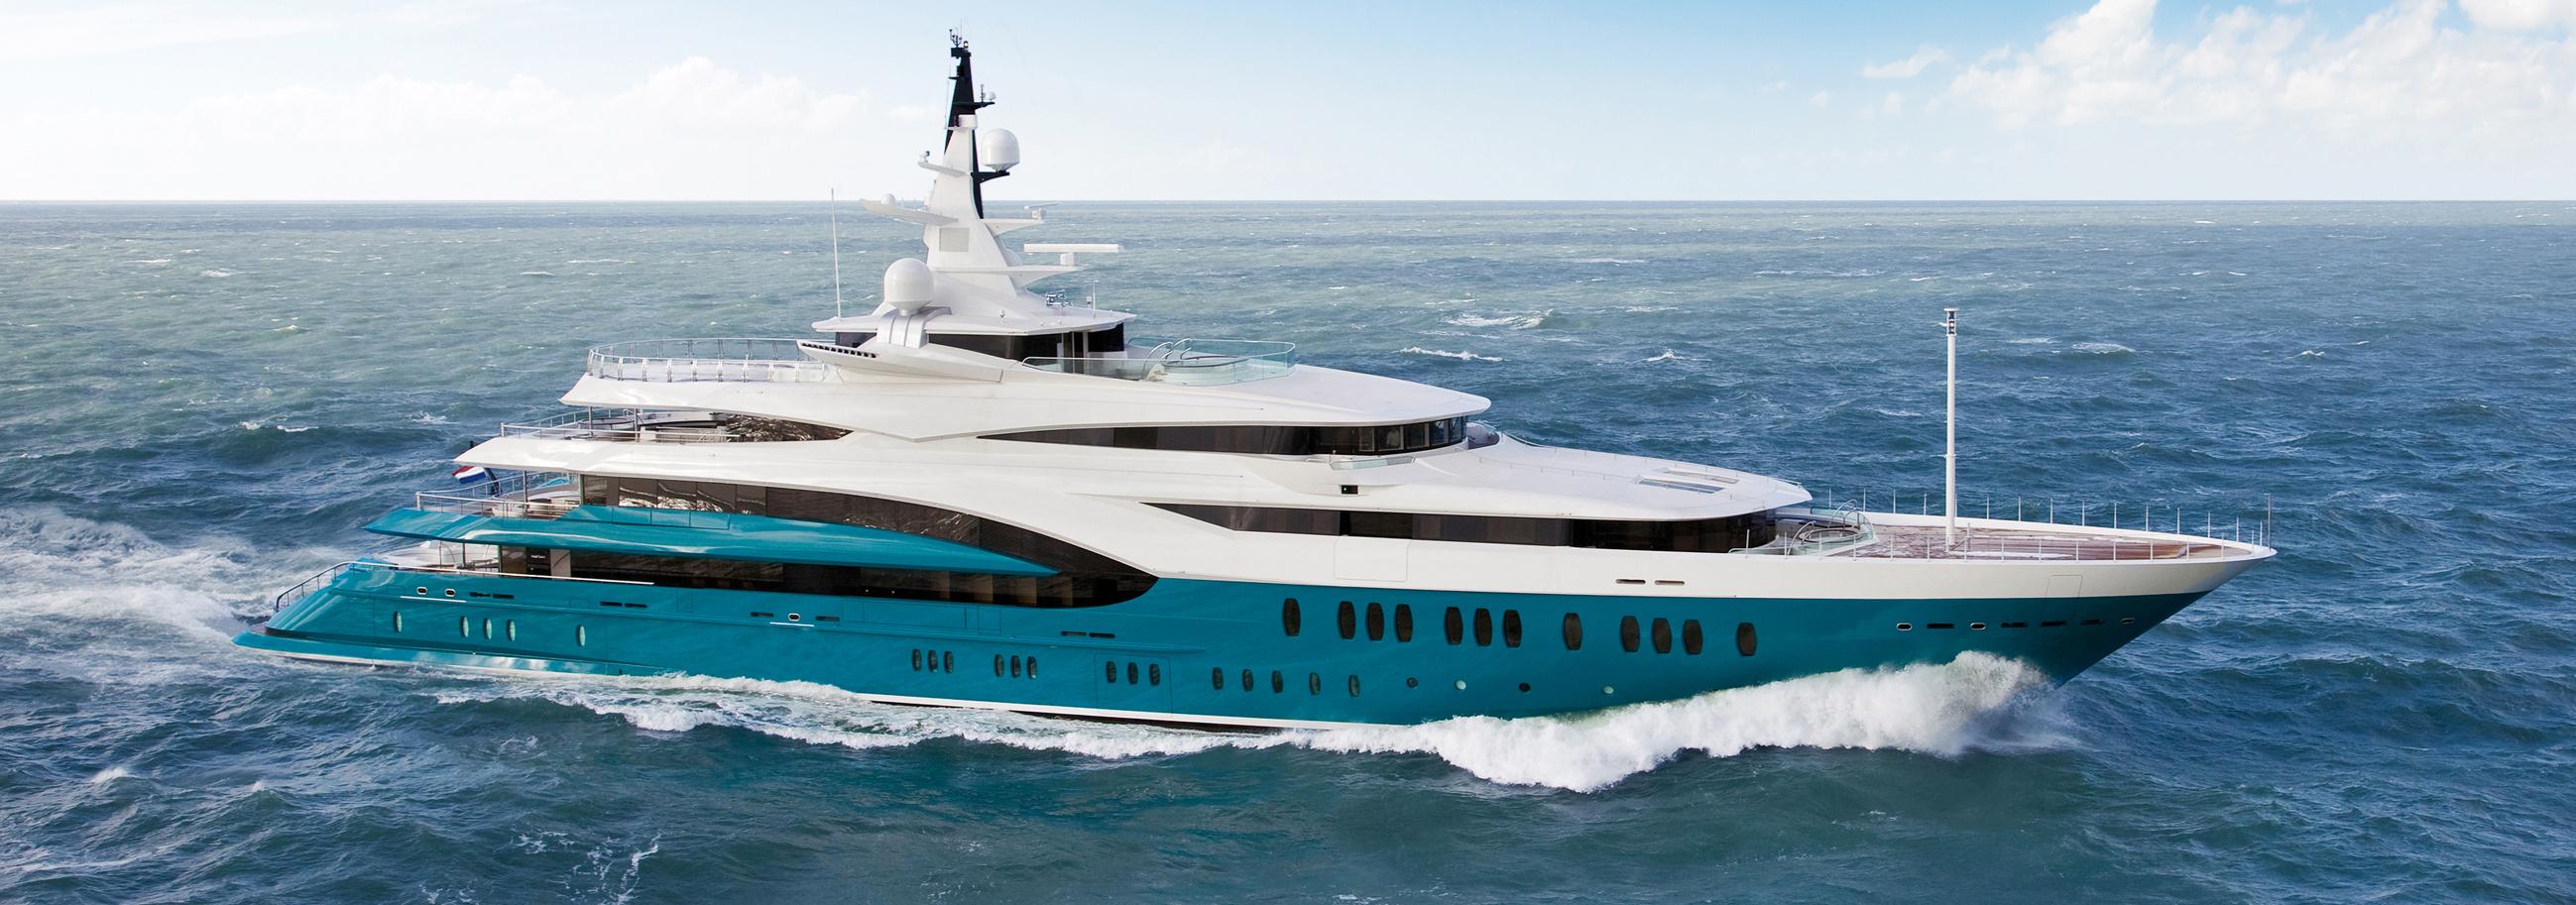 86m Oceanco Yacht Cruising Profile